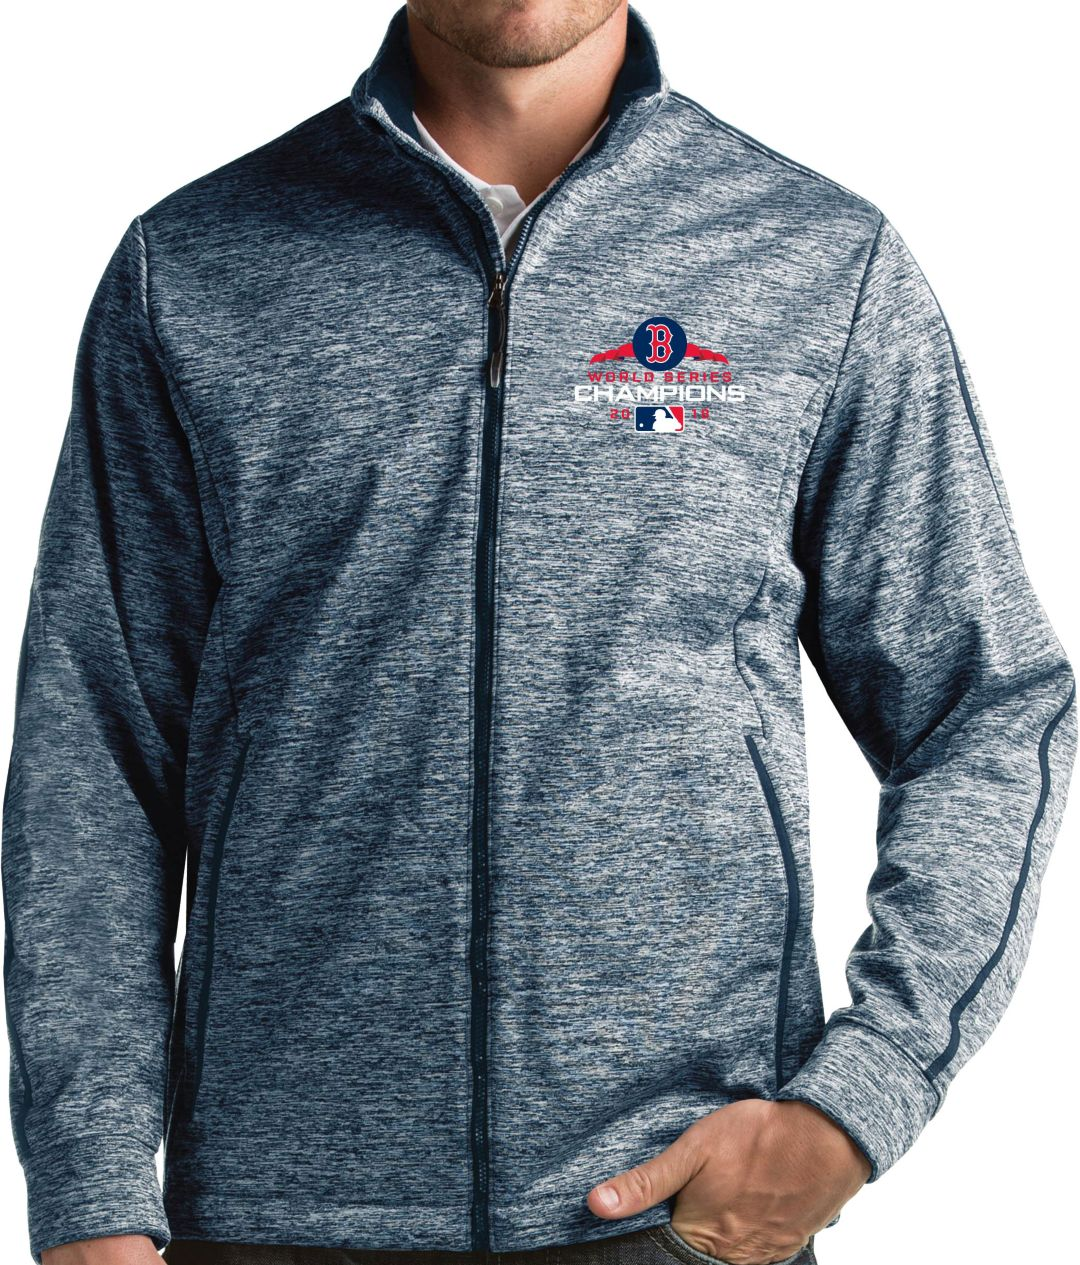 new product a71f8 b3d89 Antigua Men s 2018 World Series Champions Boston Red Sox Navy Golf Jacket.  noImageFound. 1